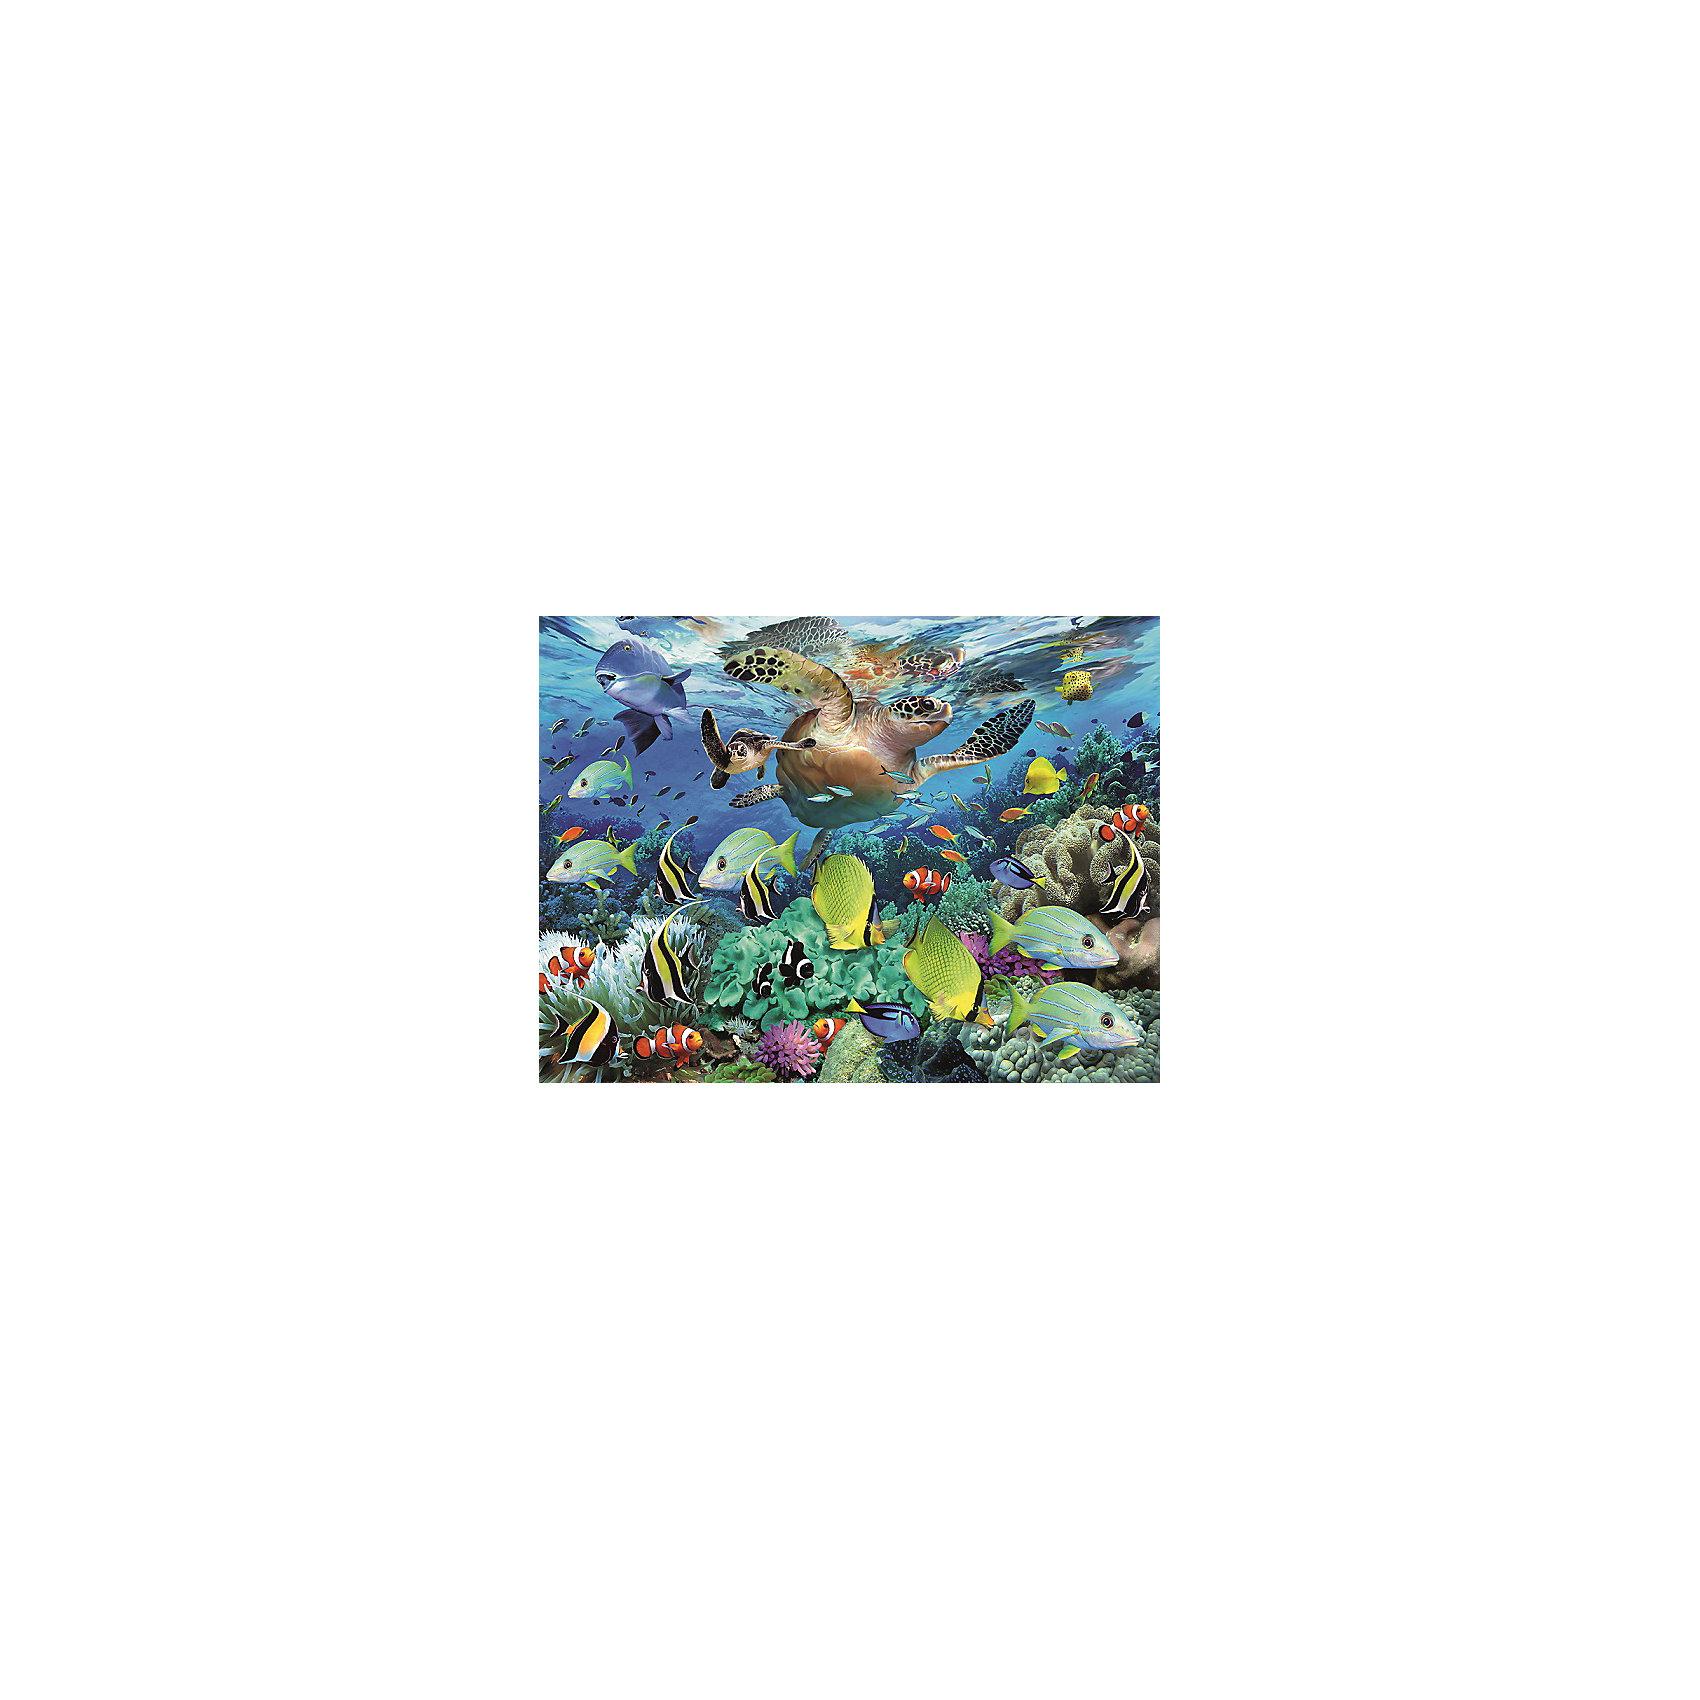 Пазл «Коралловый риф» XXL 150 шт от myToys